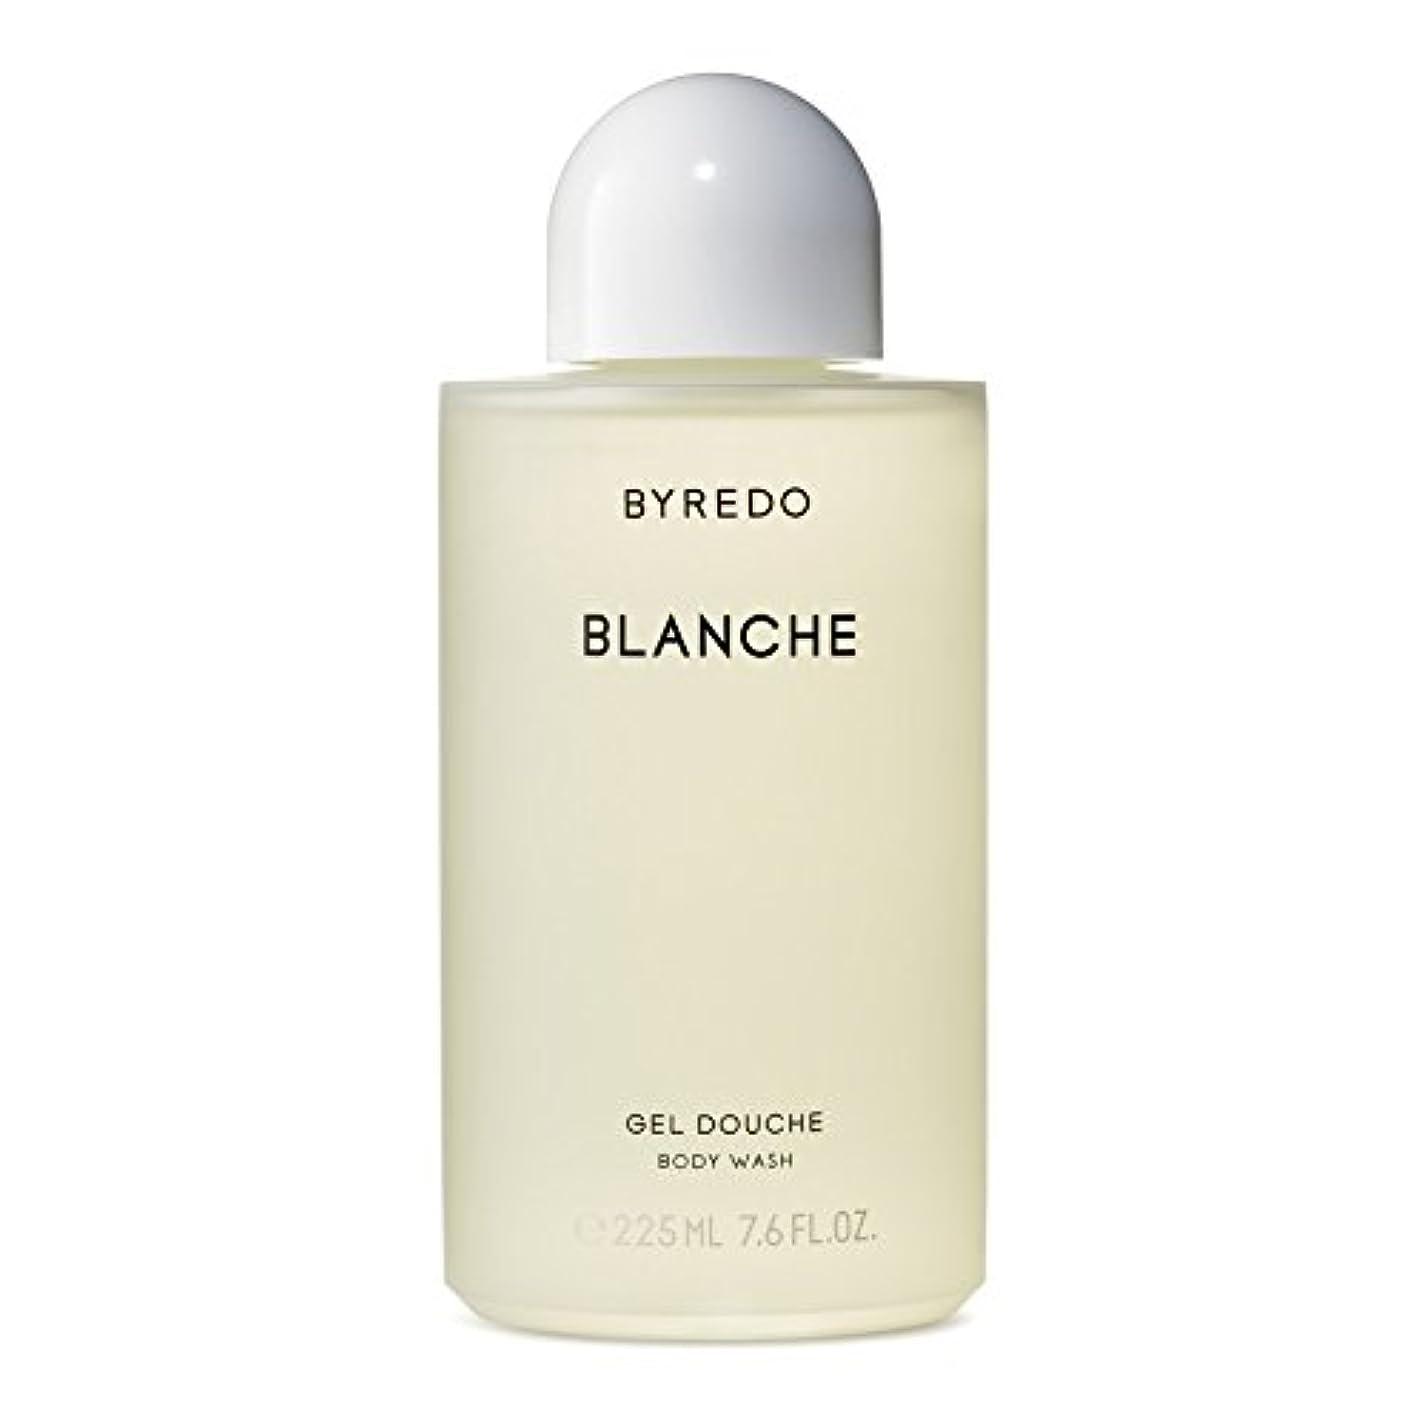 Byredo Blanche Body Wash 225ml - ブランシュボディウォッシュ225ミリリットル [並行輸入品]